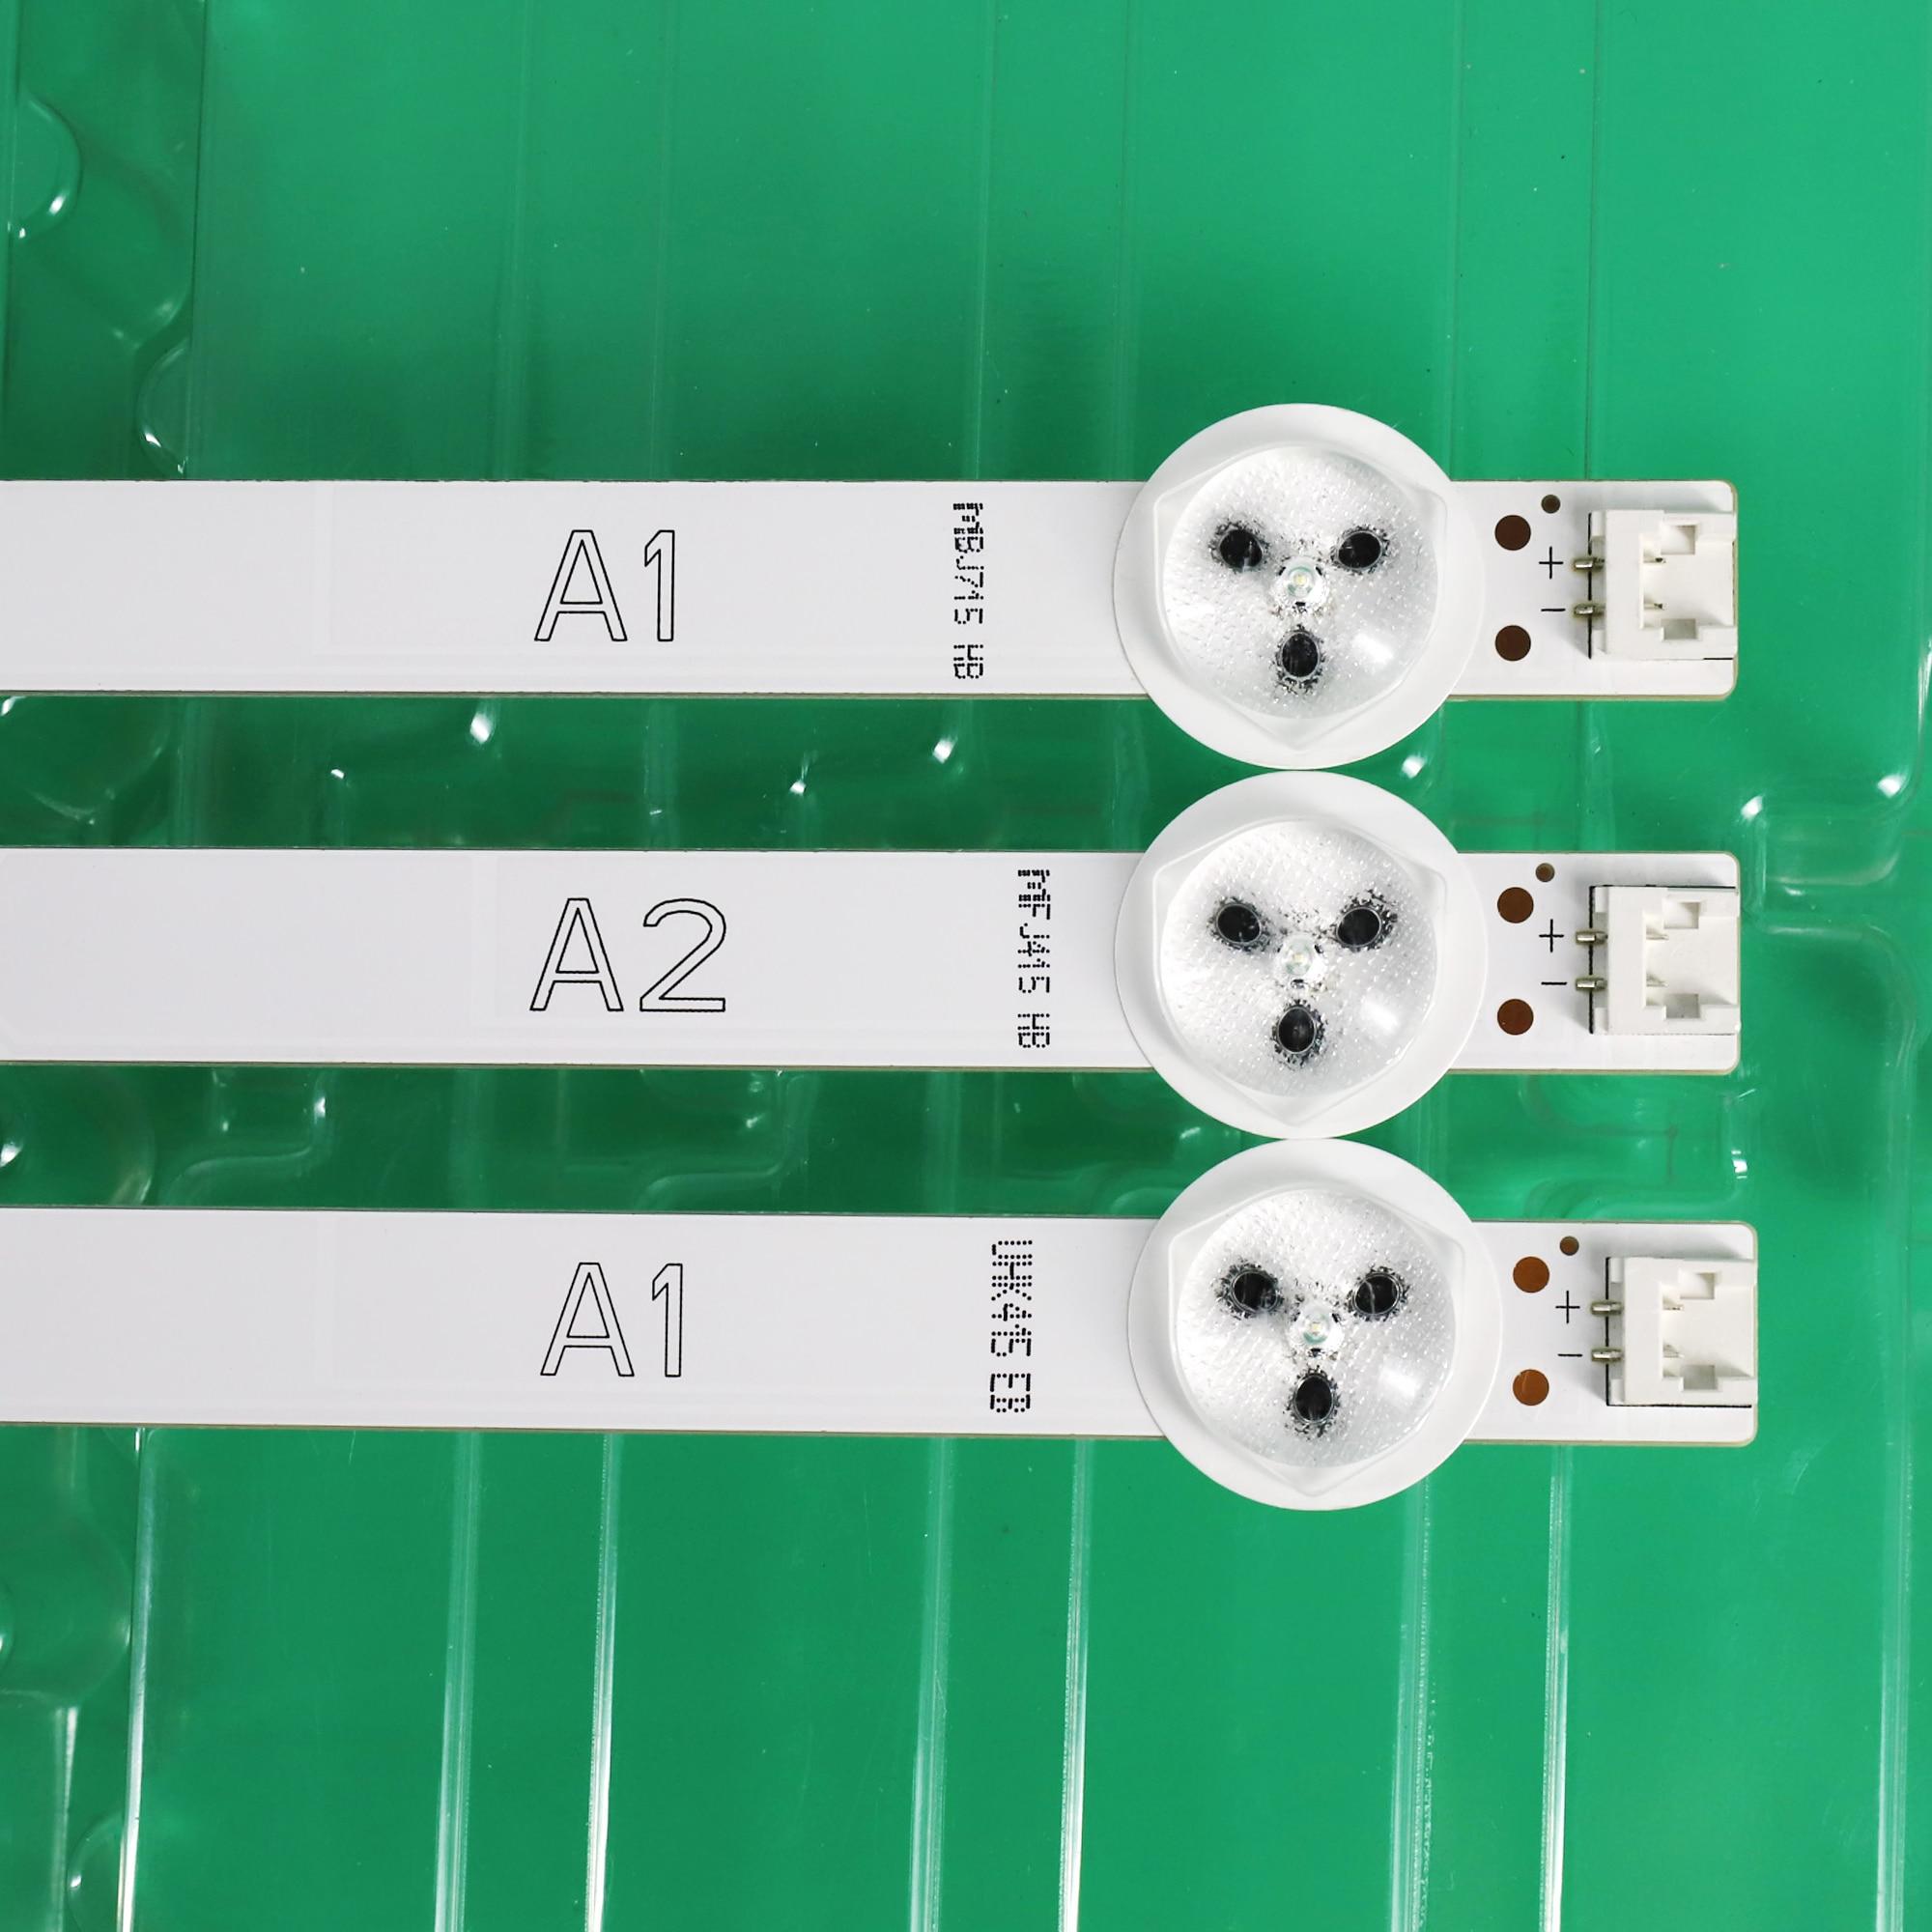 1set = 3PCS für LG 32 zoll LCD hintergrundbeleuchtung 6916L-1204A A16916L-1426A B16916L-1205A A2 6916L-1105A A1 (2PCS = 7LED + 1PCS 8LED )100% neue